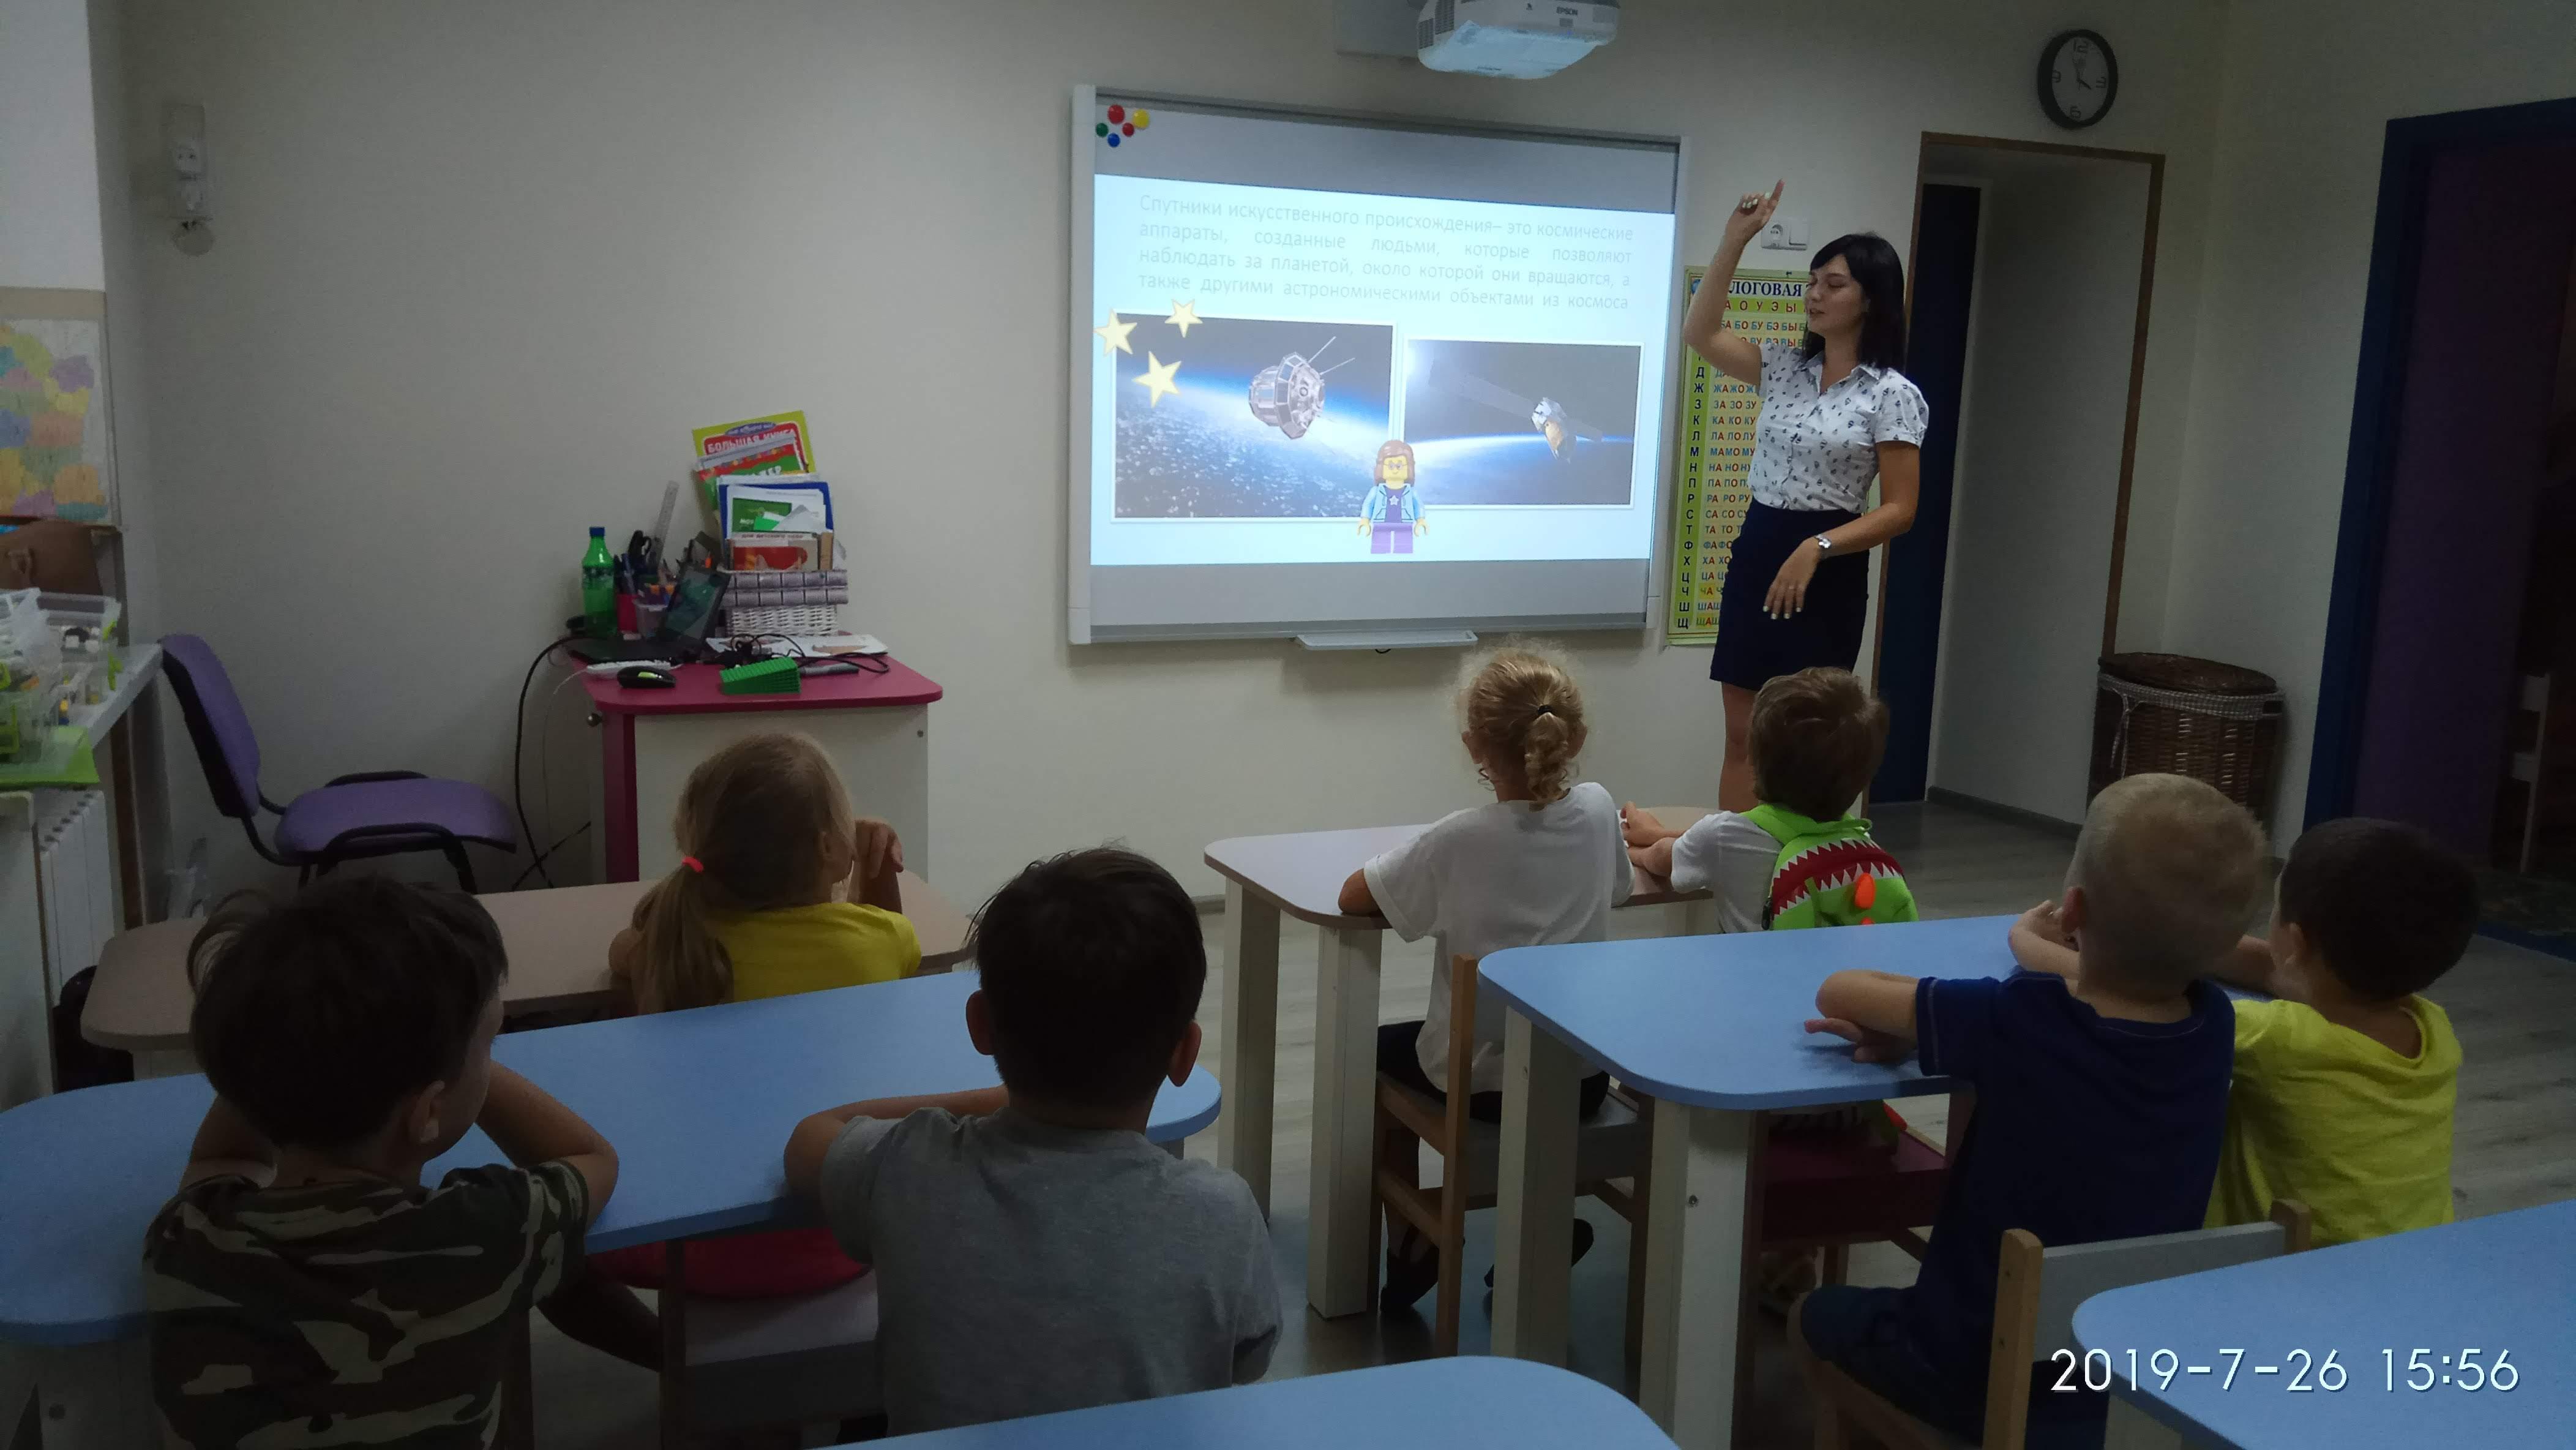 https://akademia-detstva.od.ua/app/uploads/2019/07/IMG_20190726_155640.jpg